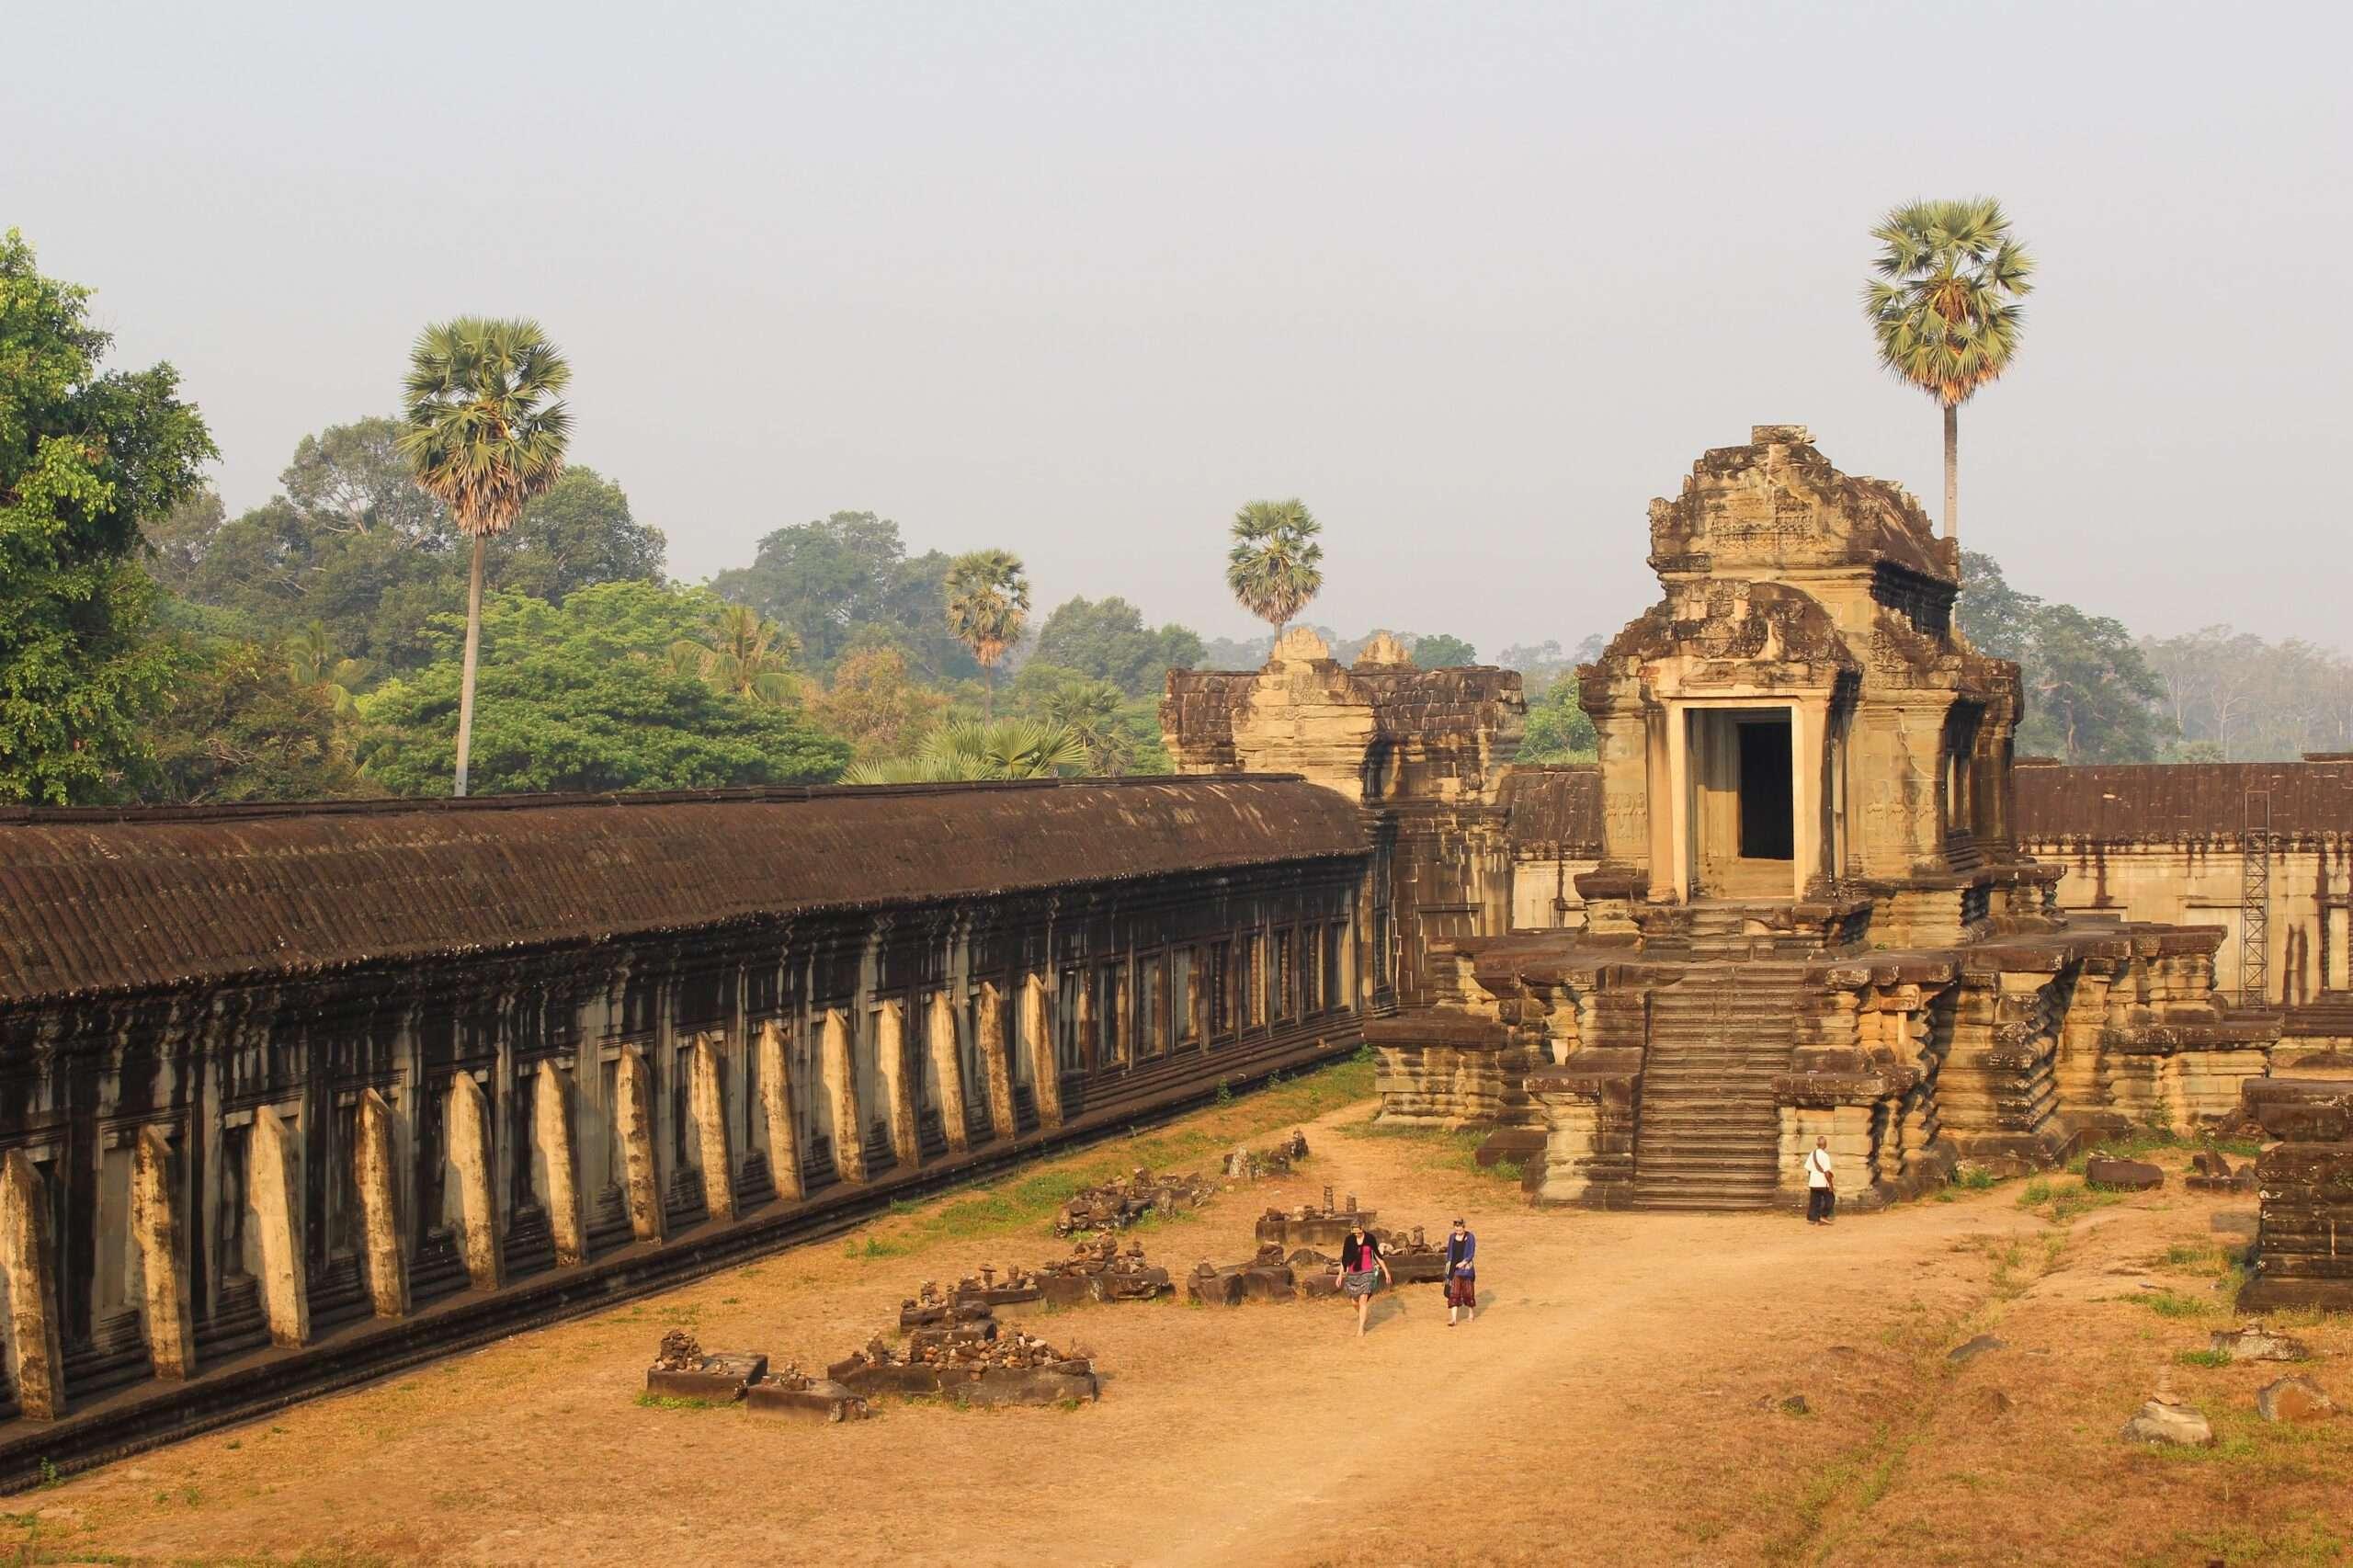 soft warm light over Angkor Wat temple at sunrise